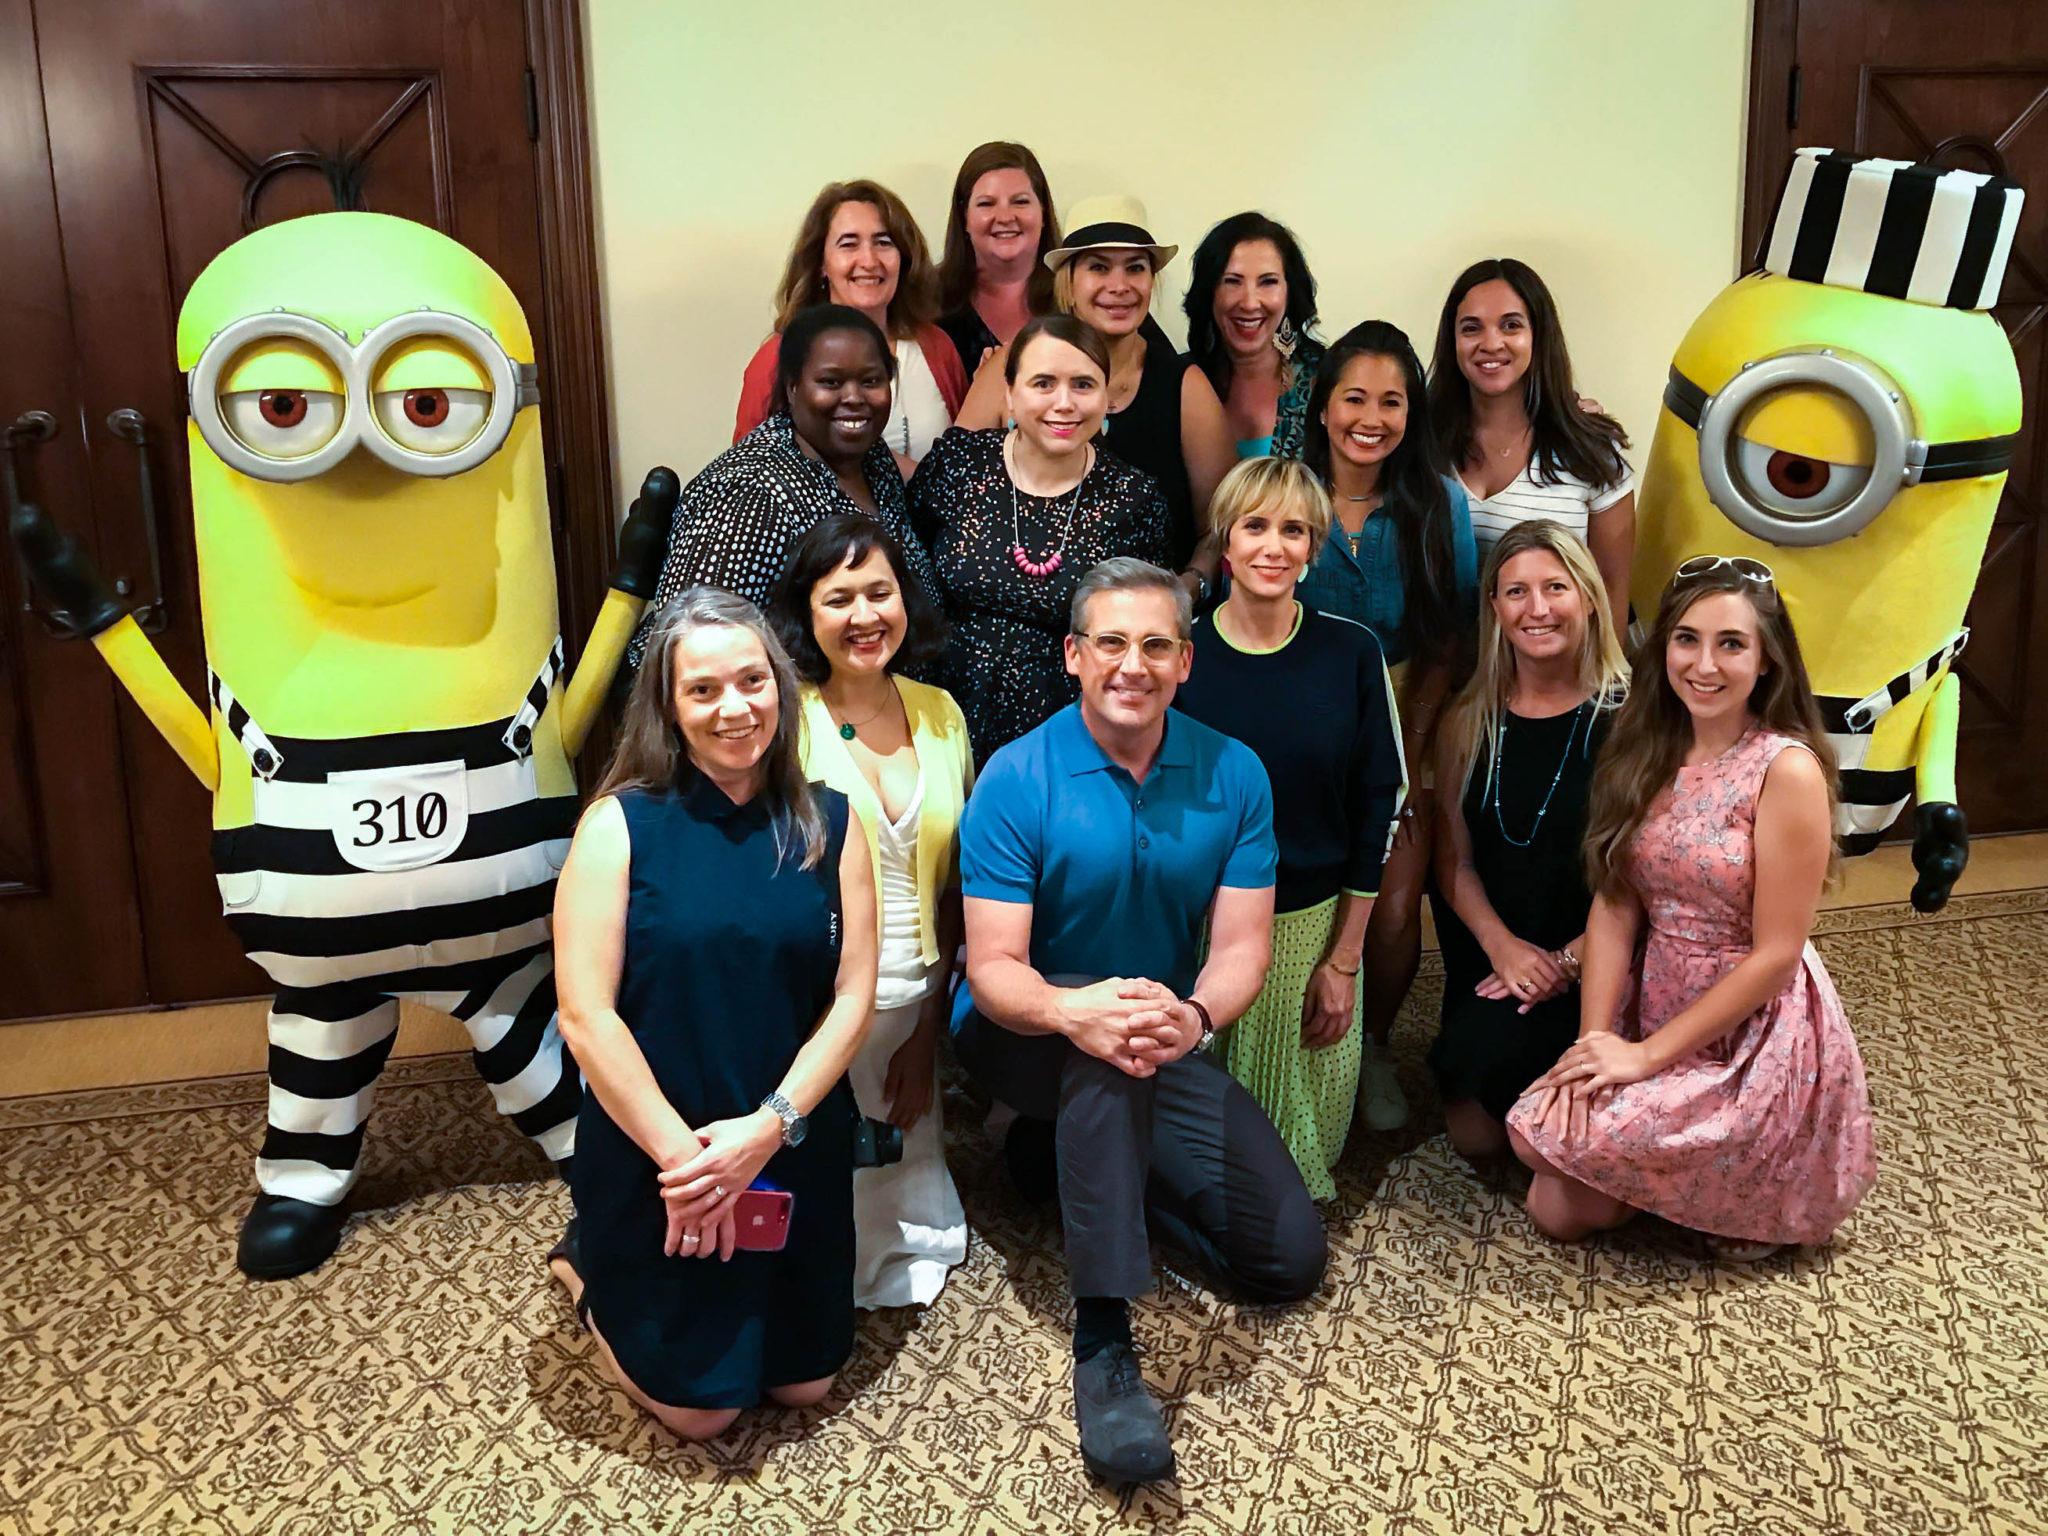 Despicable Me 3 Cast Interviews – Steve Carell, Kristen Wiig, and Pharrell Williams